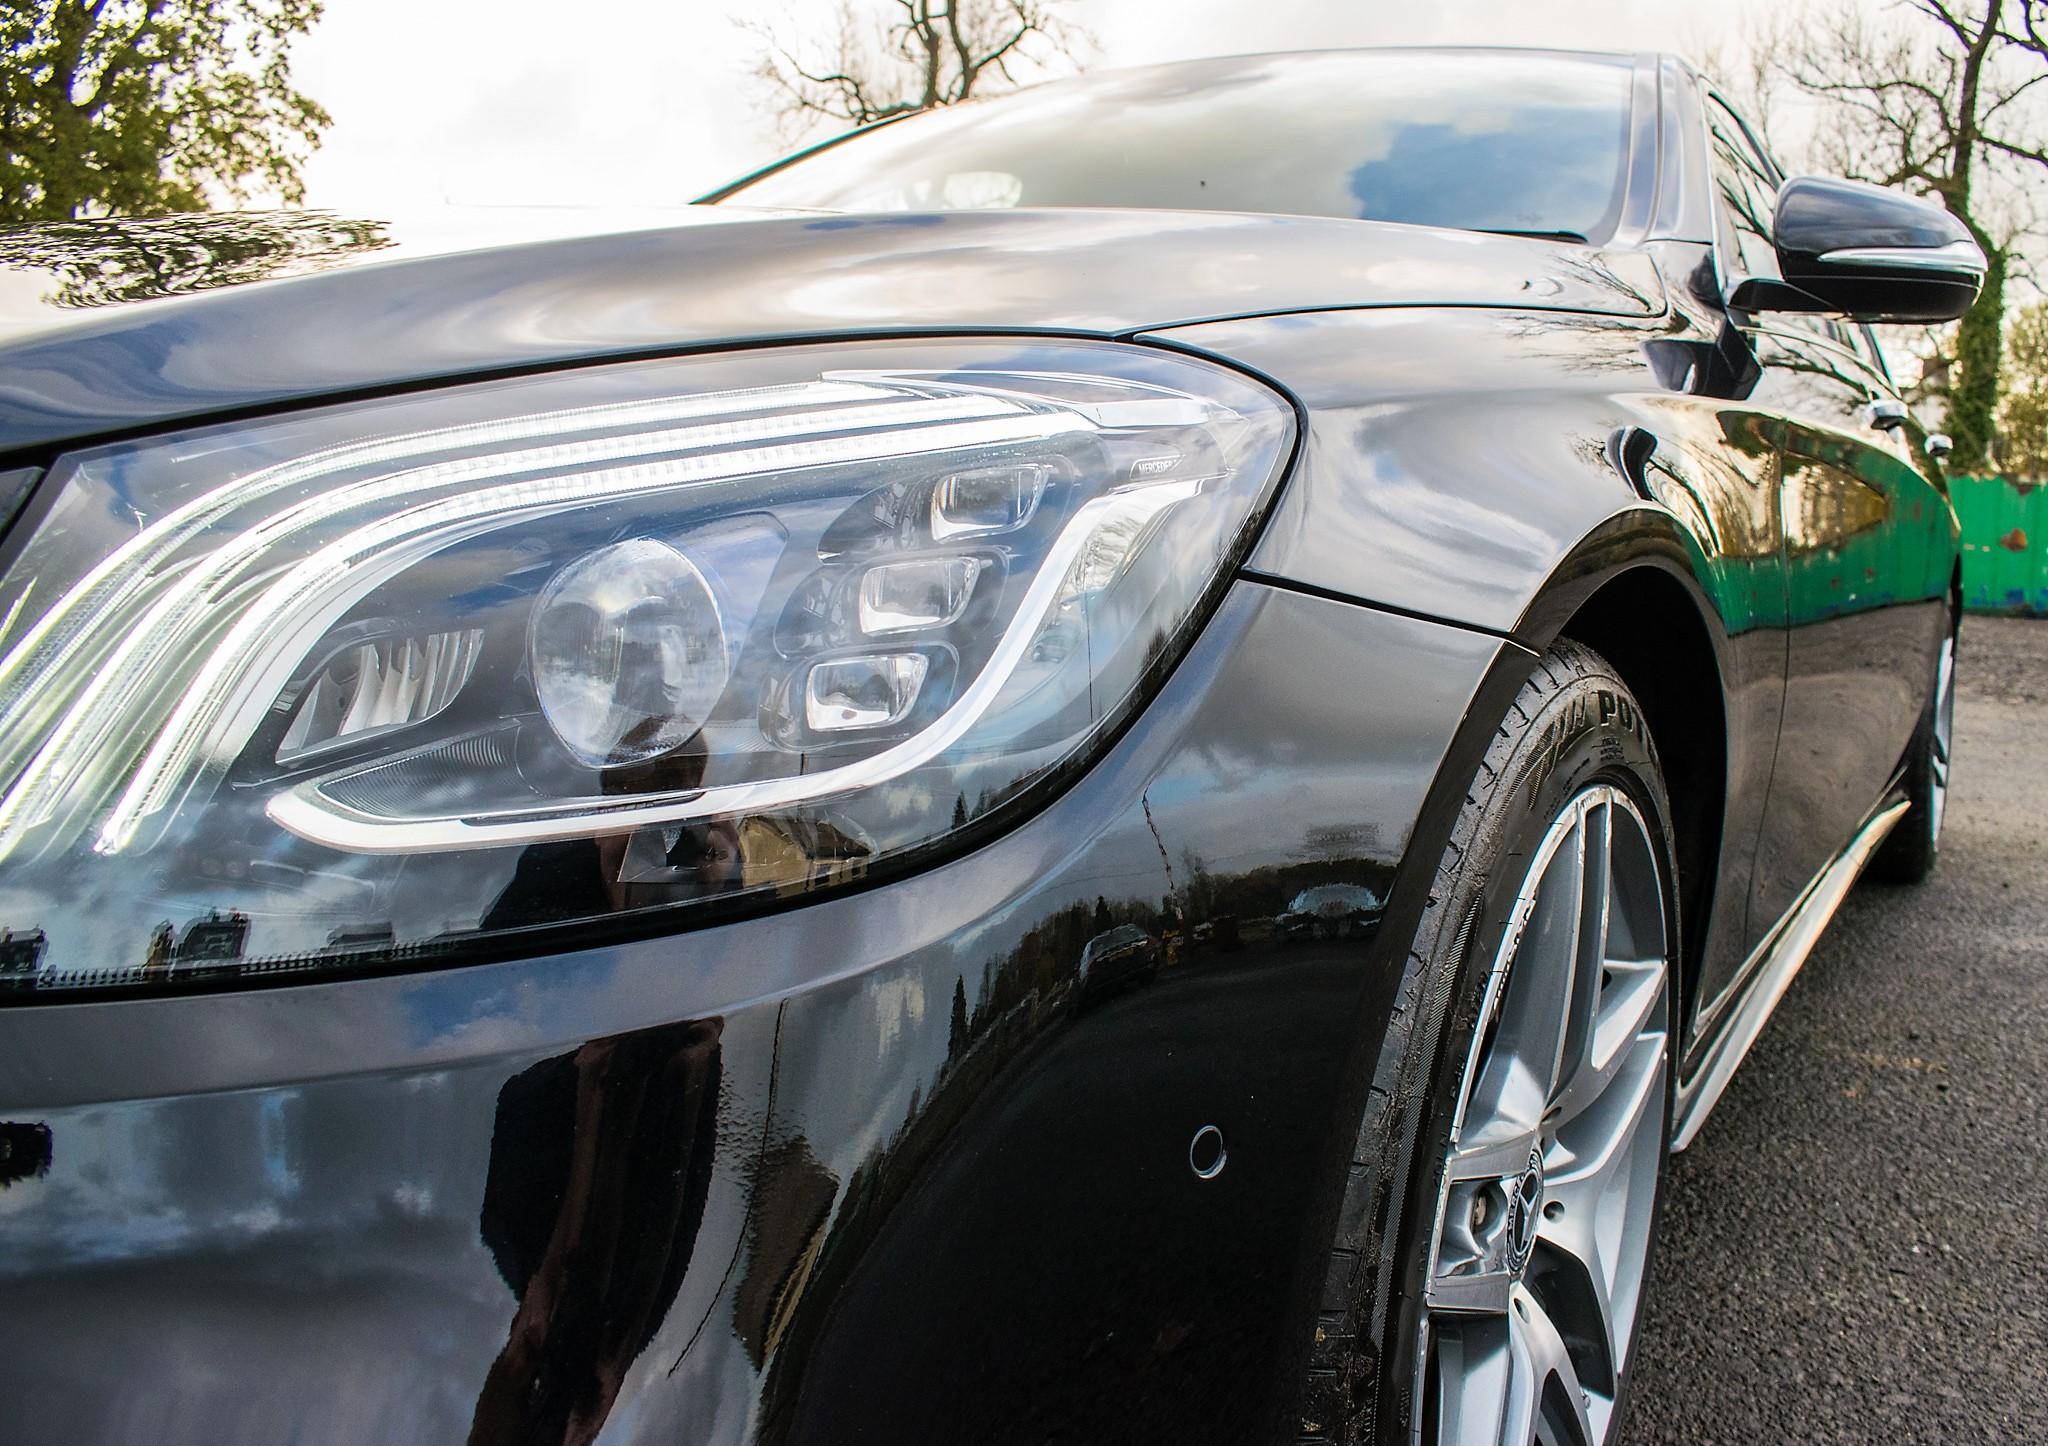 Mercedes Benz S450 L AMG Line Executive auto petrol 4 door saloon car Registration Number: FX68 - Image 12 of 33